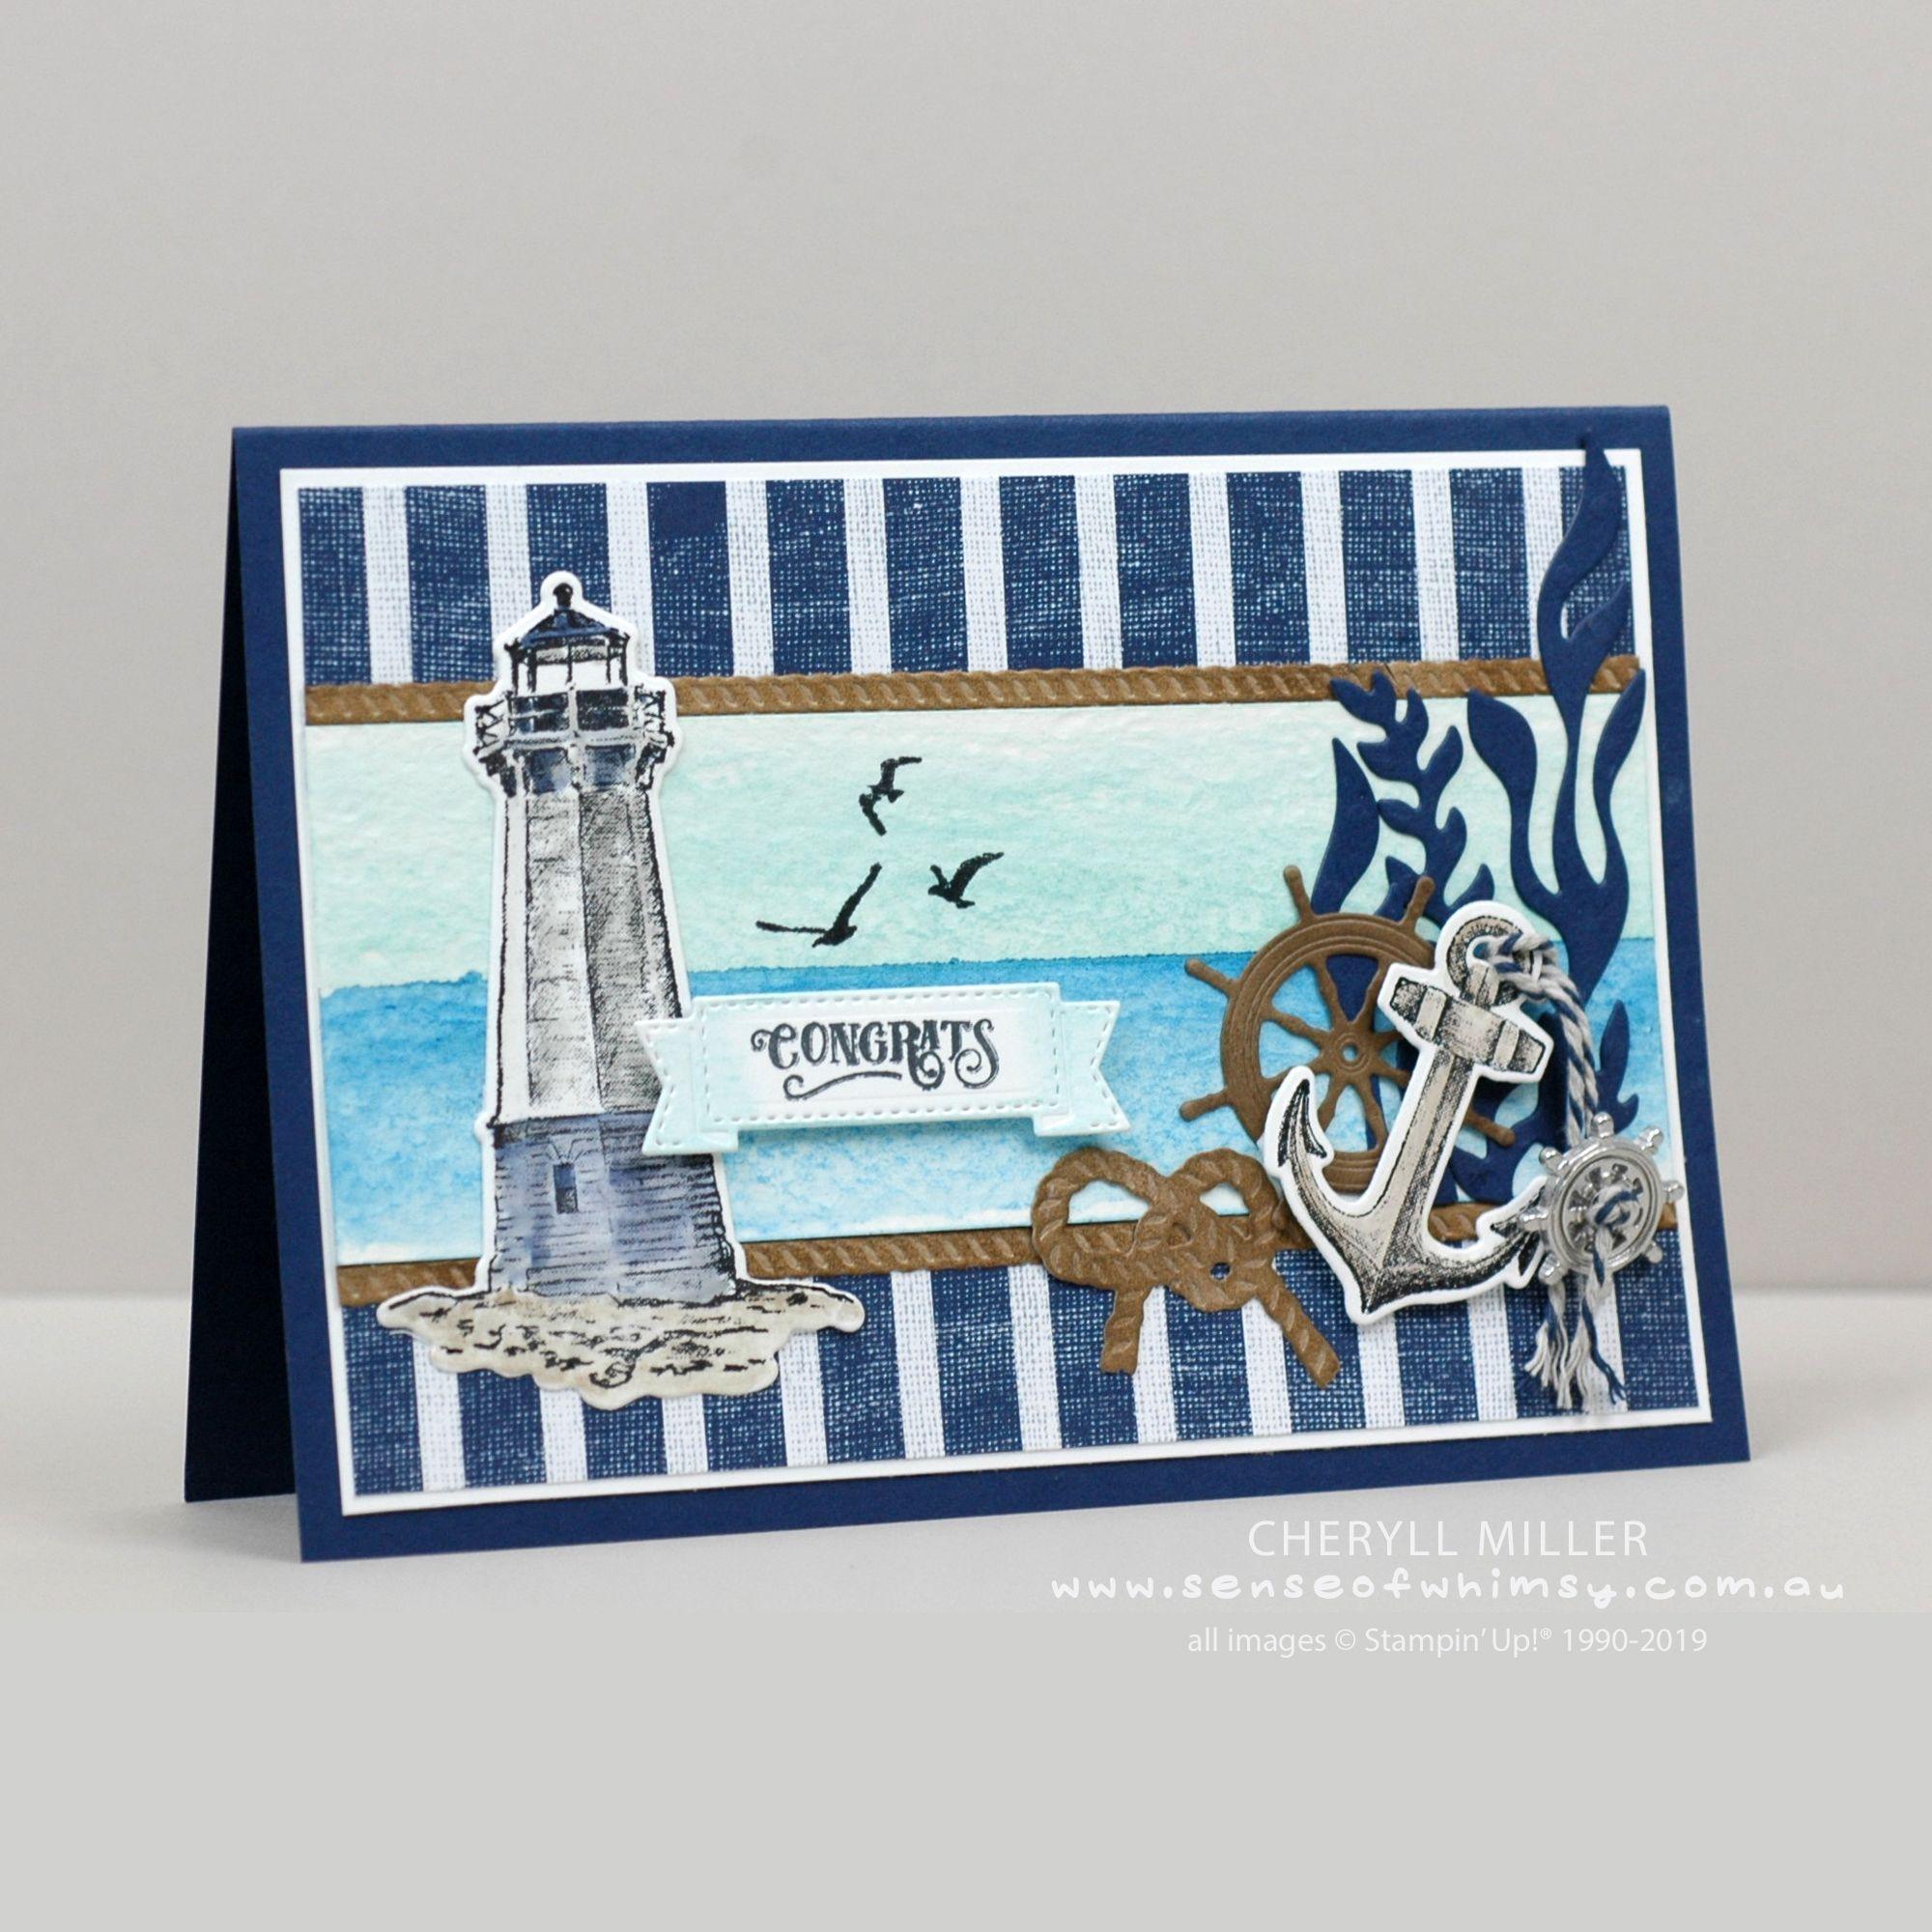 Come Sail Away Product Suite #stampinupcatalog Congrats Card, Product Spotlight sample featuring the Come Sail Away Suite by Stampin' Up! #stampinup!cards